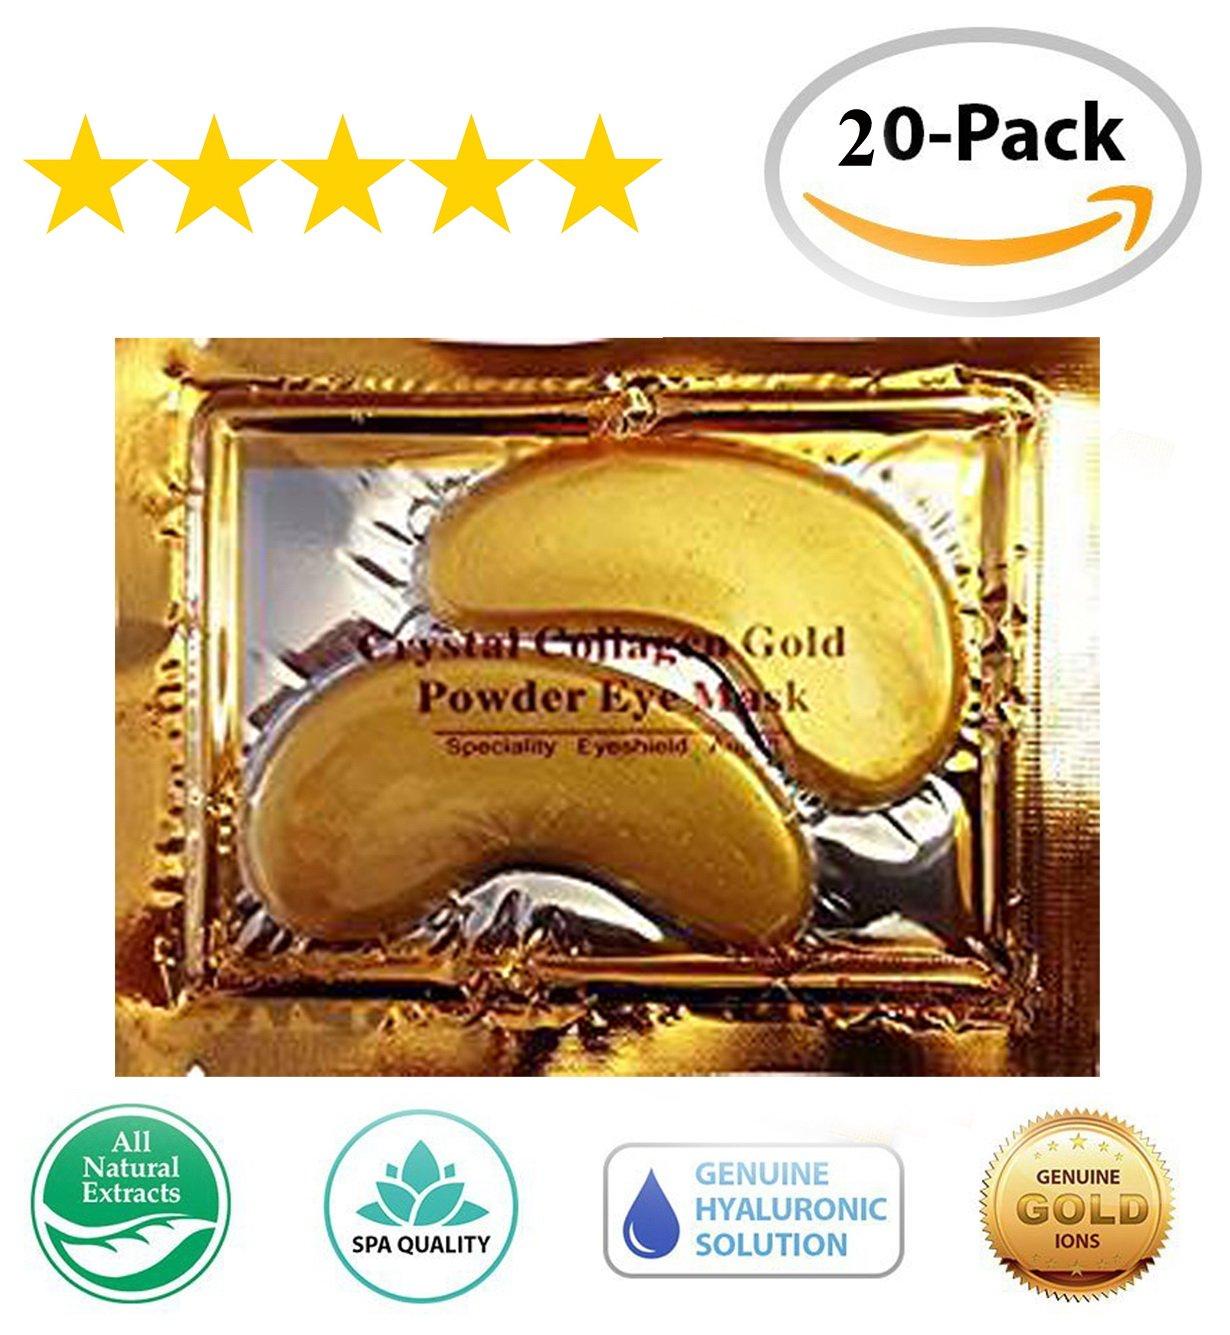 20 Pair/40 Pcs Anti Aging Crystal 24k Gold Collagen Eye Mask Smooth Wrinkles for Eye Skin Care, No Dark Circles Anti-wrinkle Eye Bags Treatment